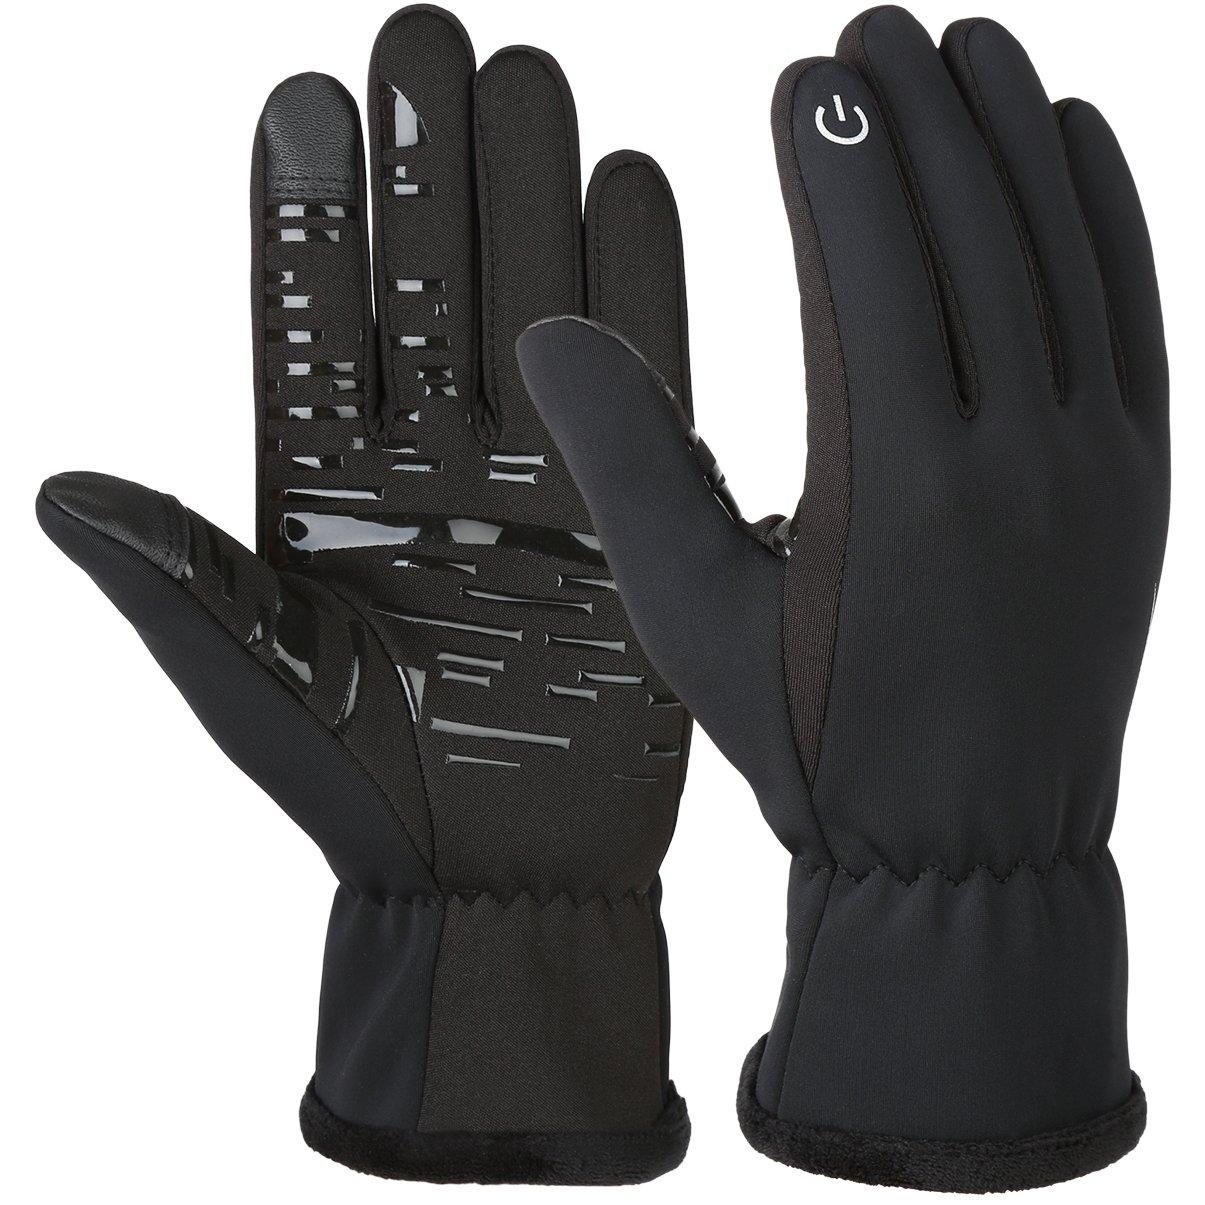 Vbiger Herren Touchscreen Fahrhandschuhe SMS Handschuhe für Frühling Herbst Winter, Gr.-L, Schwarz-2